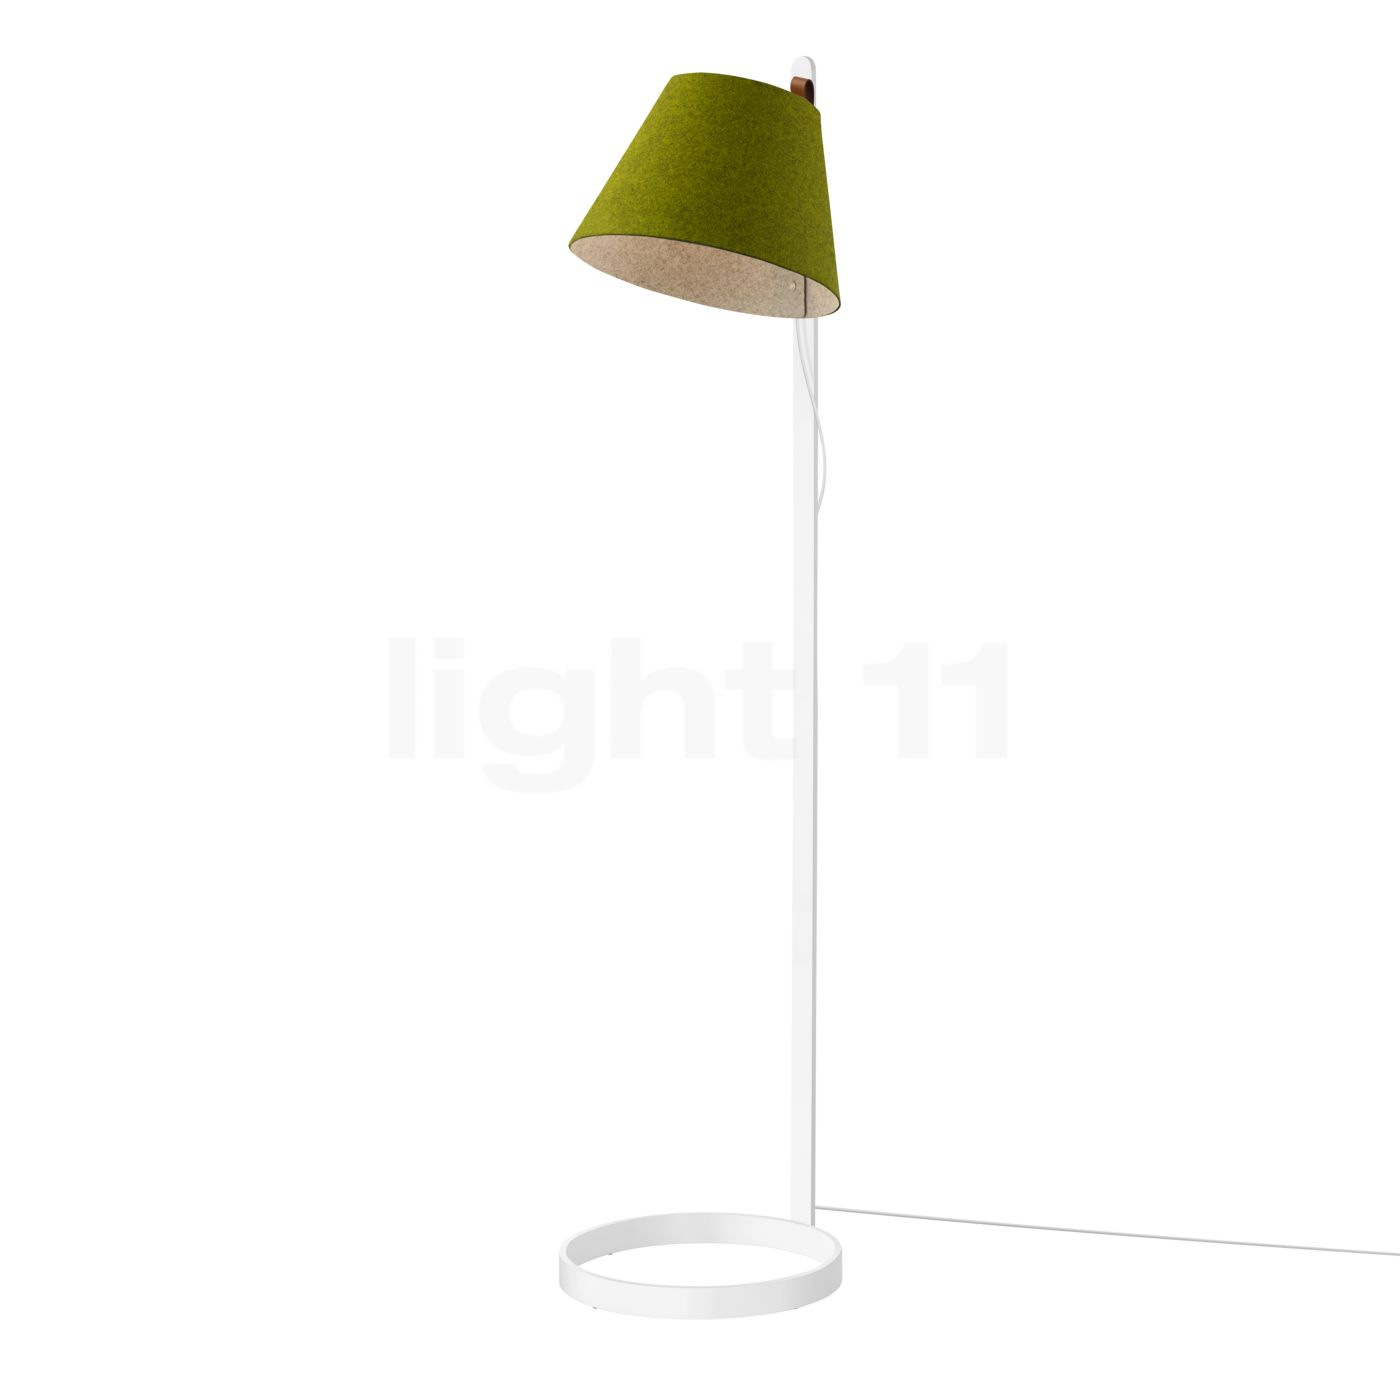 Floor Lana Designs Led Pablo Lamp Light11 Buy At eu sCrQthdx